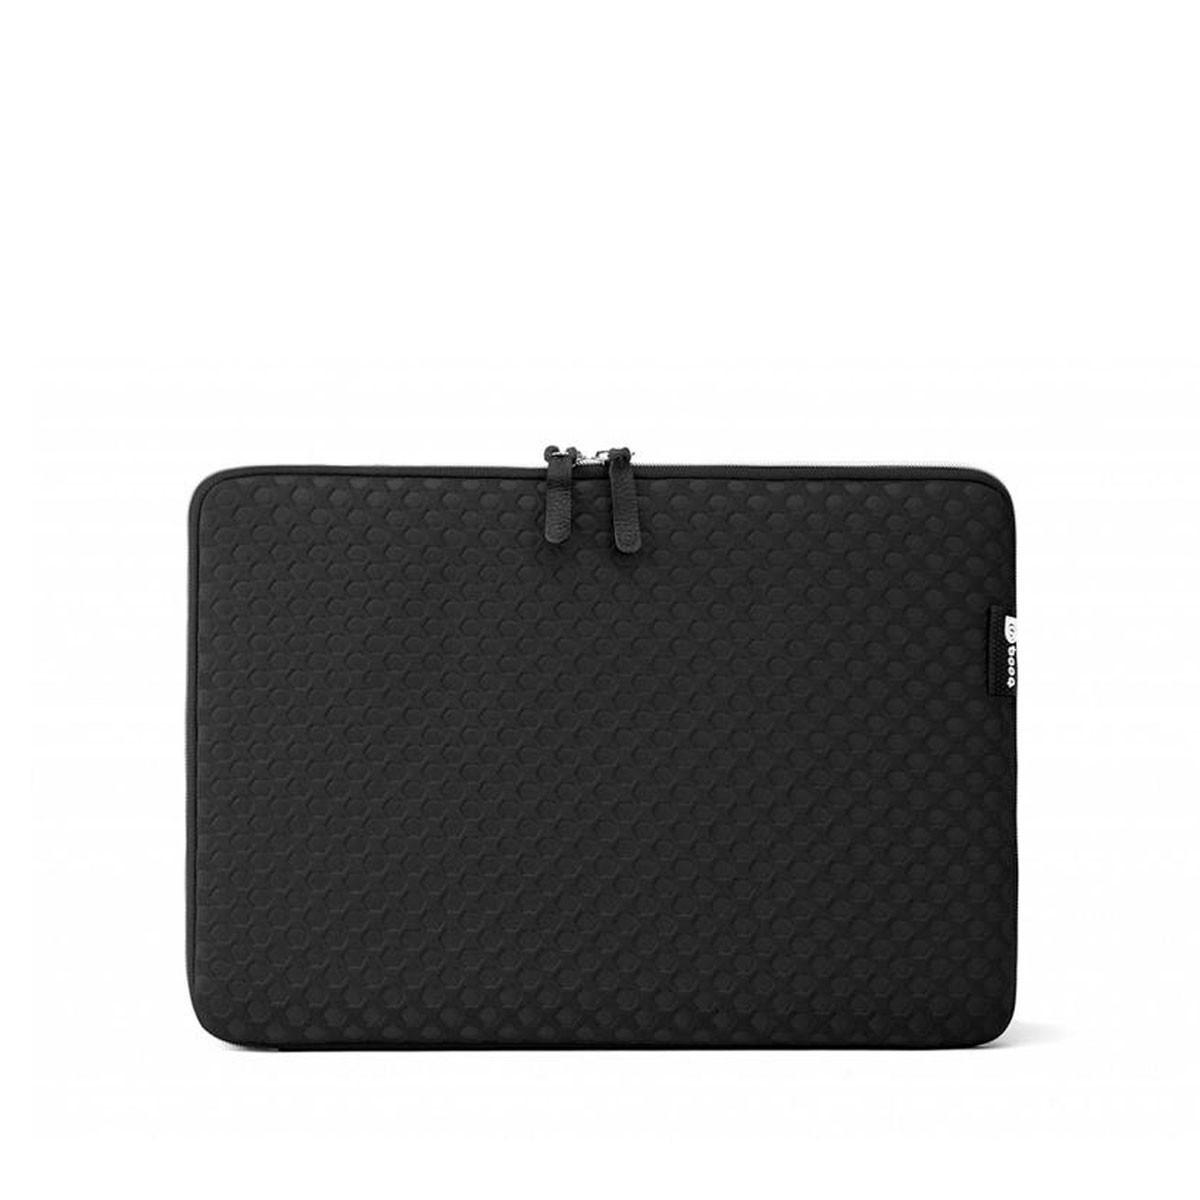 "Booq Taipan 13T, neoprenové pouzdro pro MacBook Pro 13"" 2016 - černé"